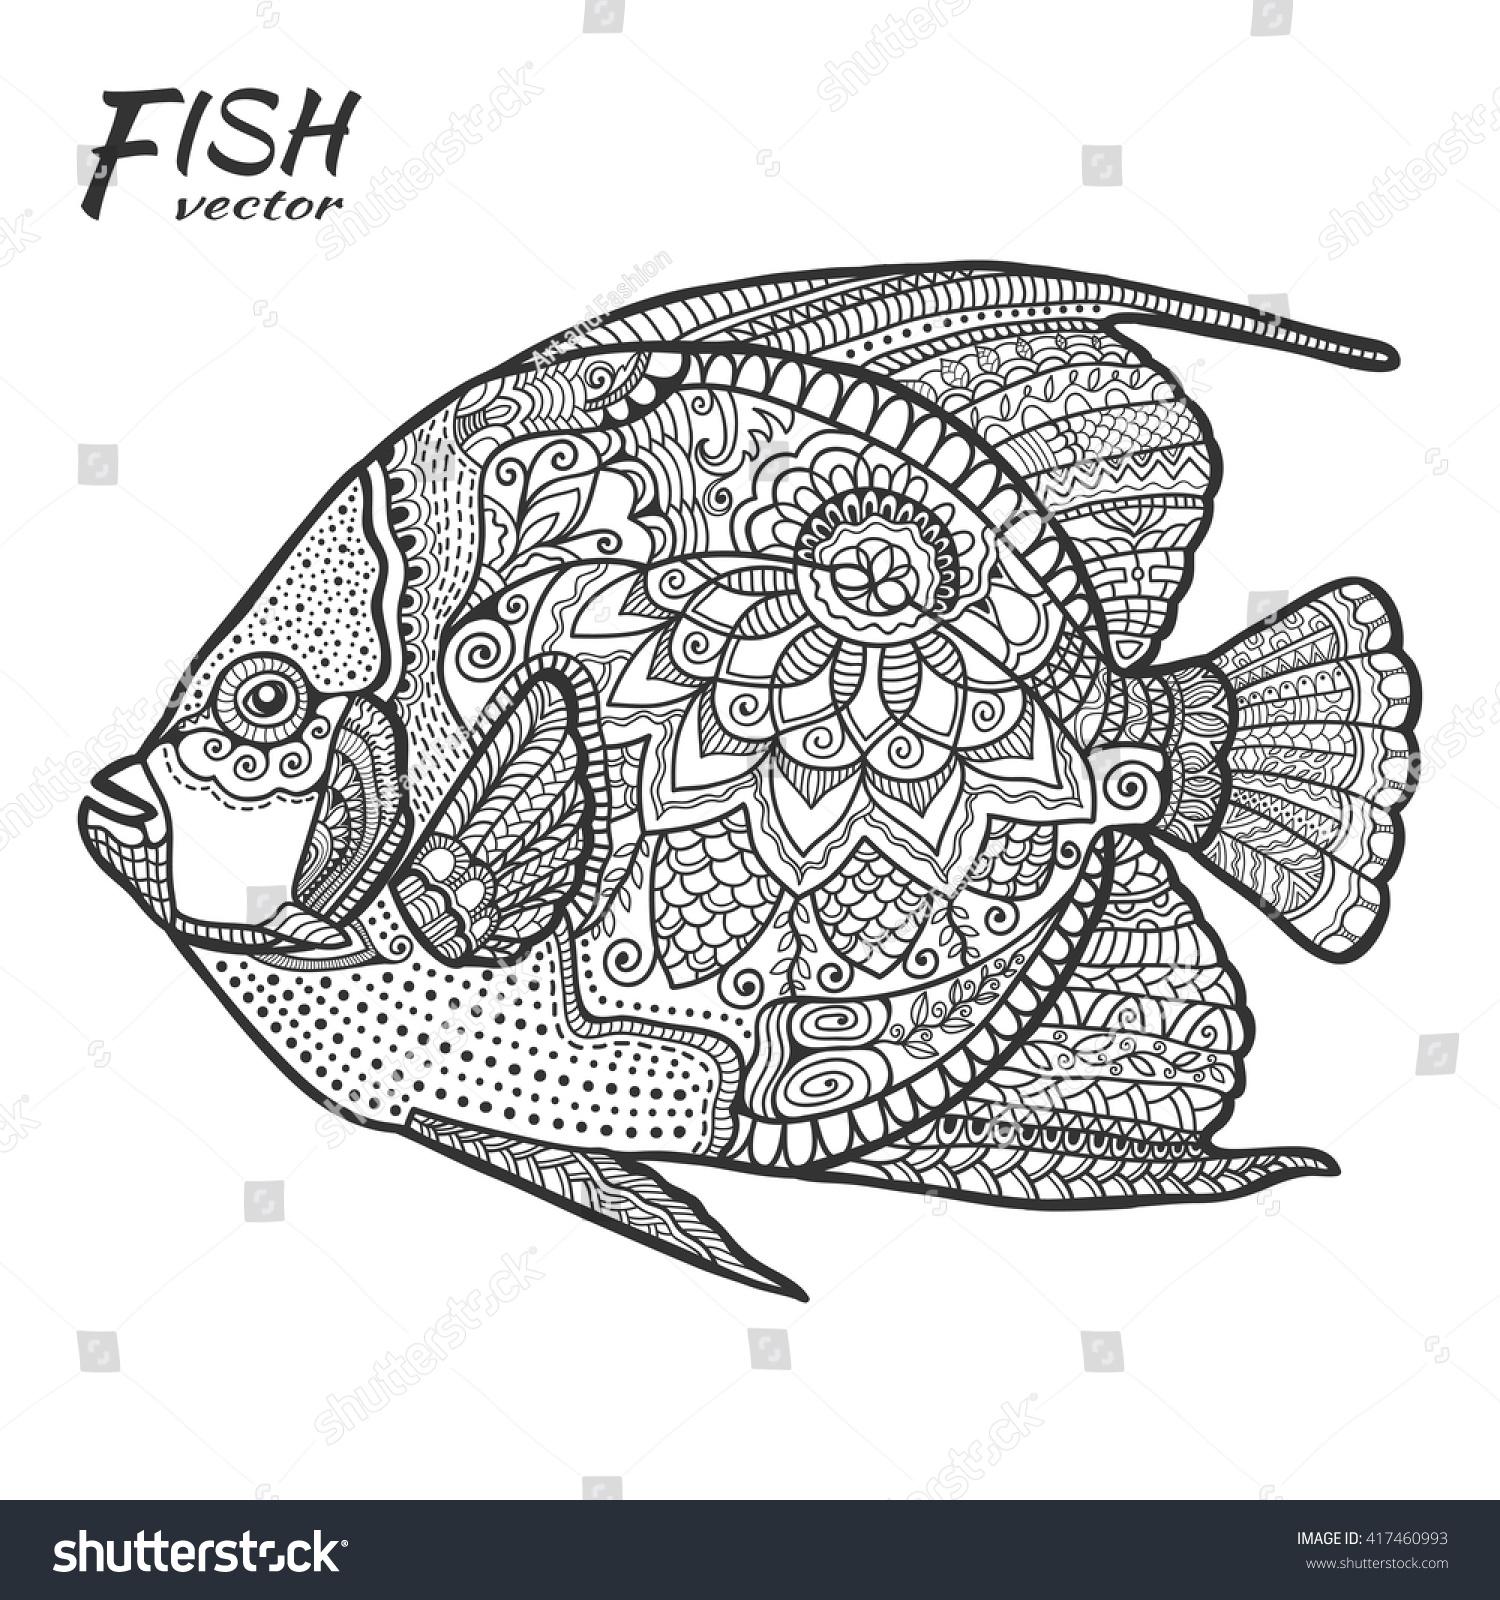 Zen ocean colouring book - Hand Drawn Stylized Sea Fish Ethnic Floral Pattern Zen Doodle Style Art